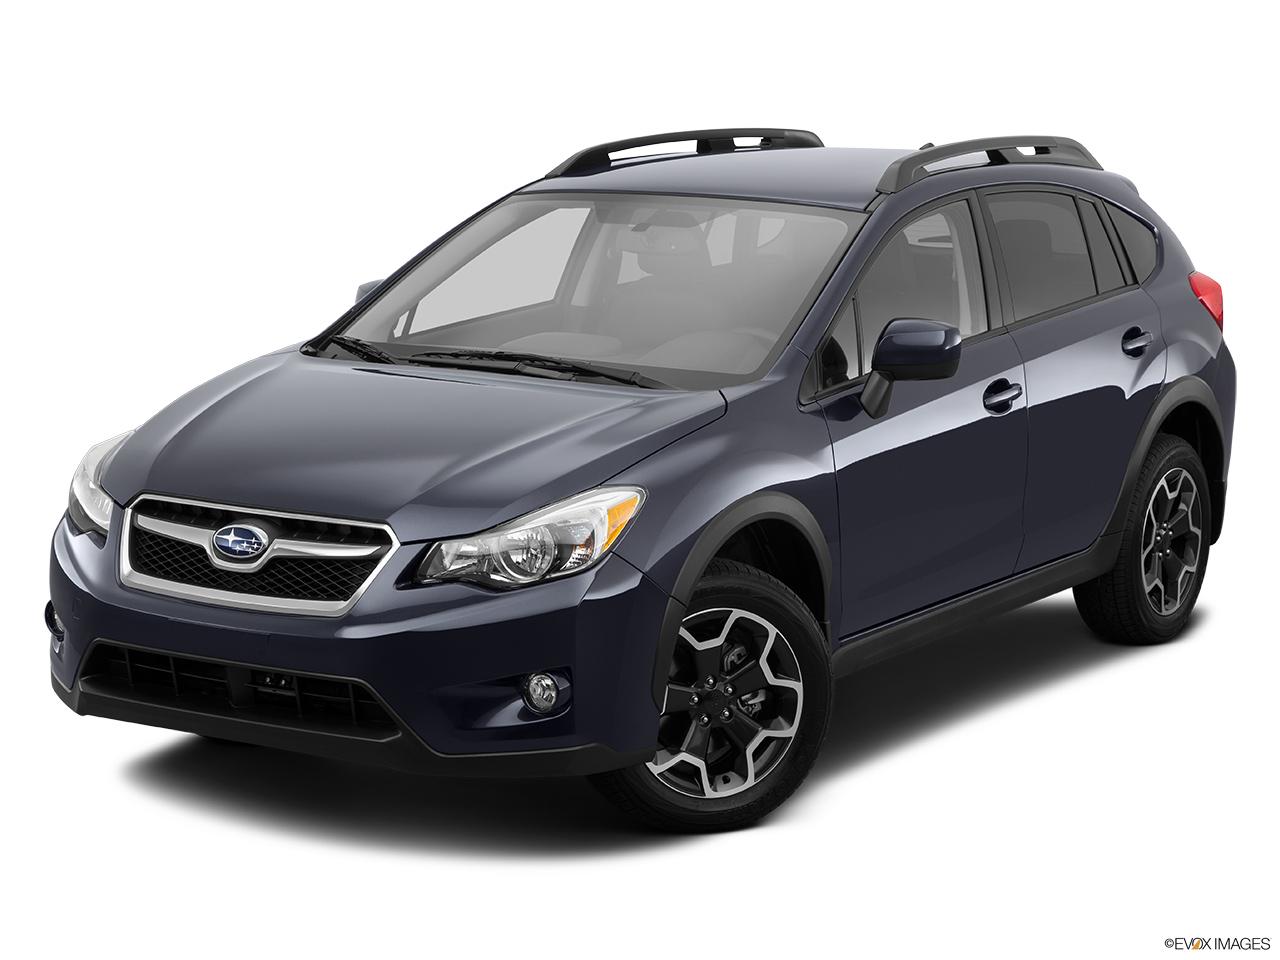 2014 Subaru Xv Crosstrek 2 0i Limited - Subaru Xv Crosstrek Dr Automatic  I Limited